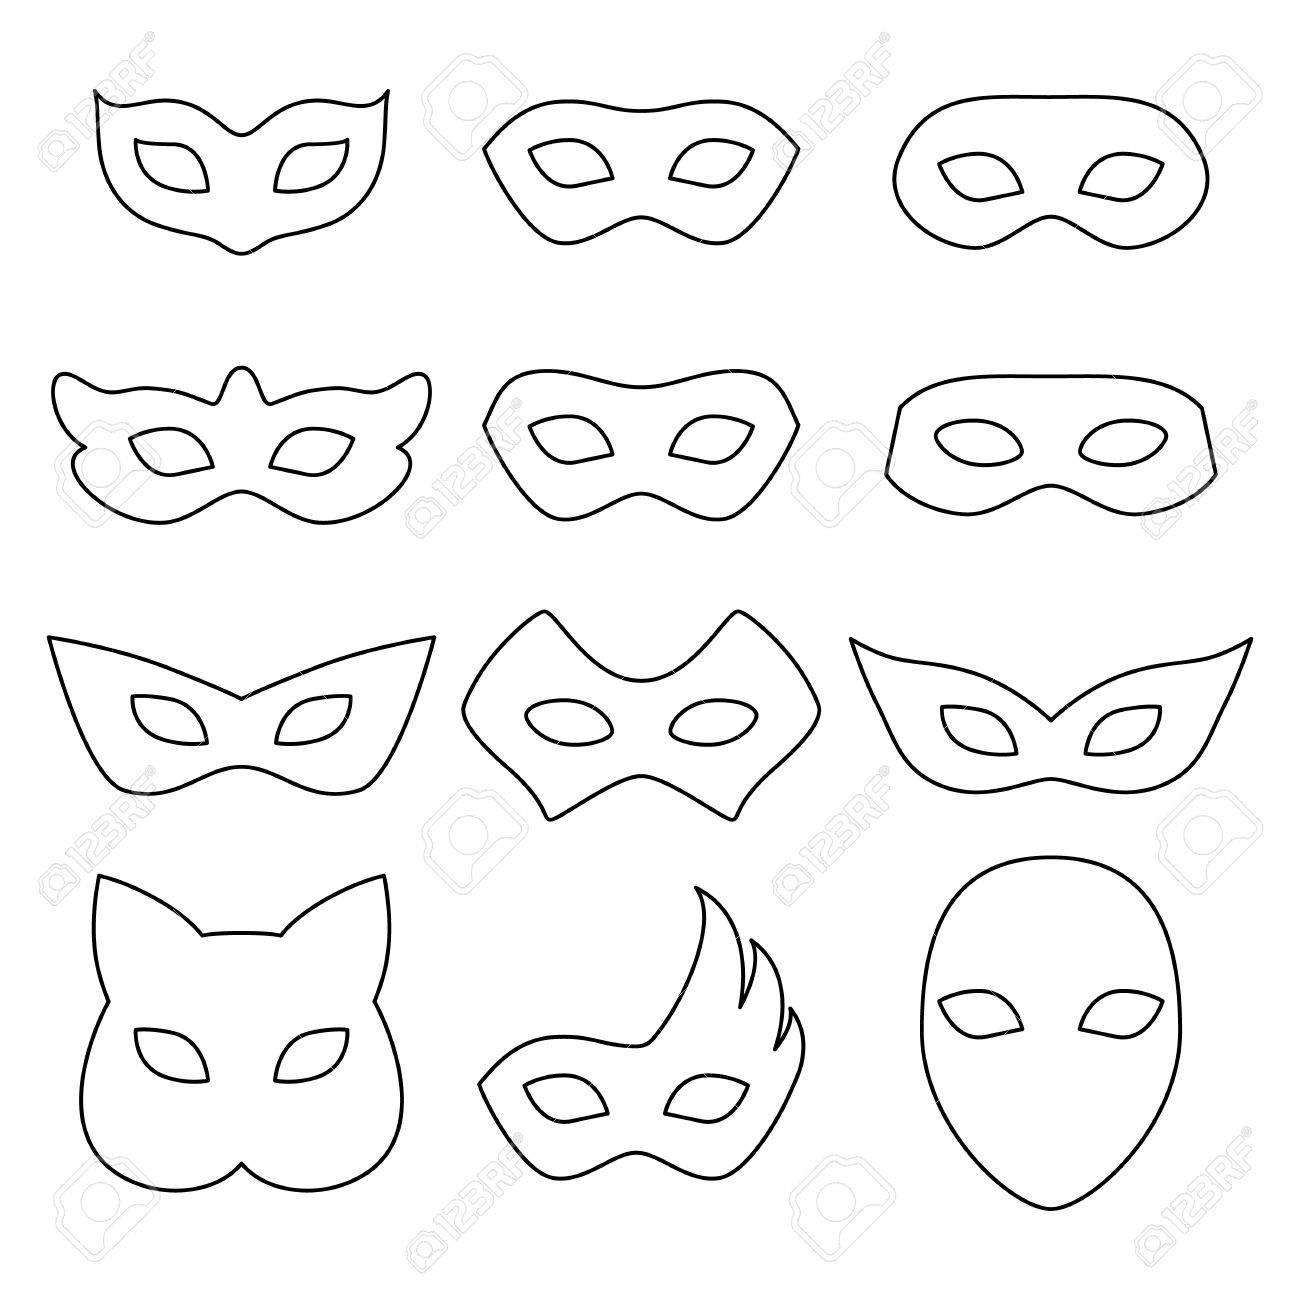 Uncategorized Blank Mask Template blank carnival assorted masks icons templates set illustration party masquerade symbol black color